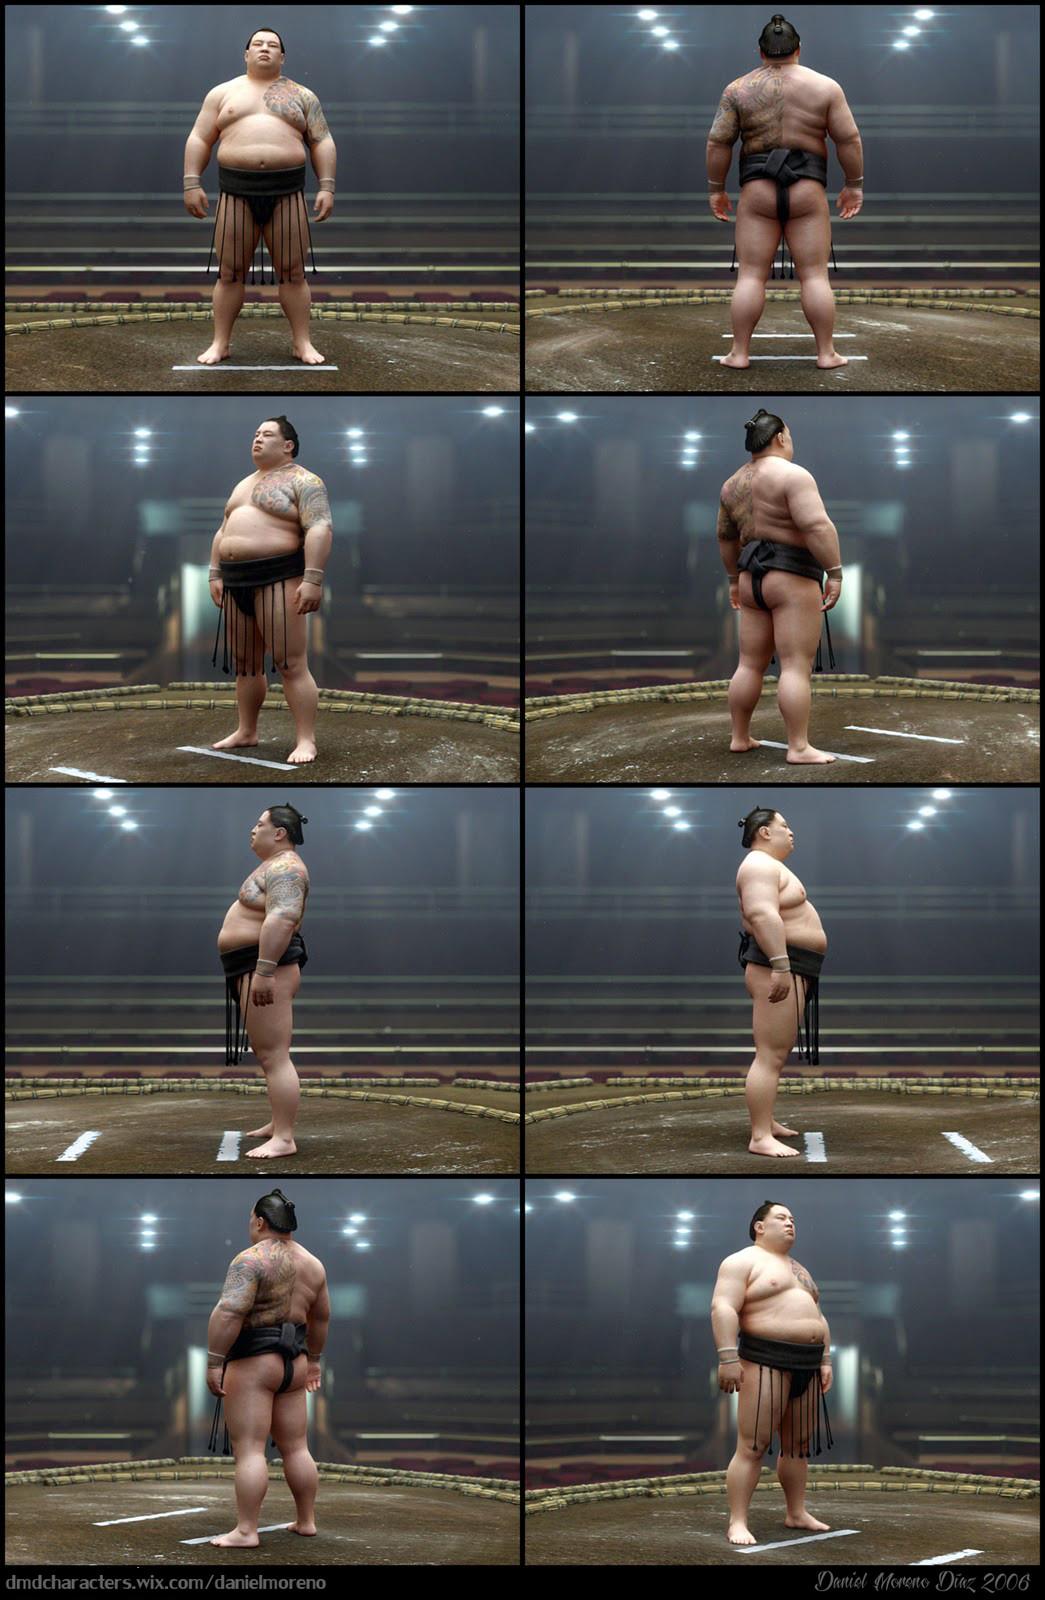 Daniel moreno diaz sumo frames